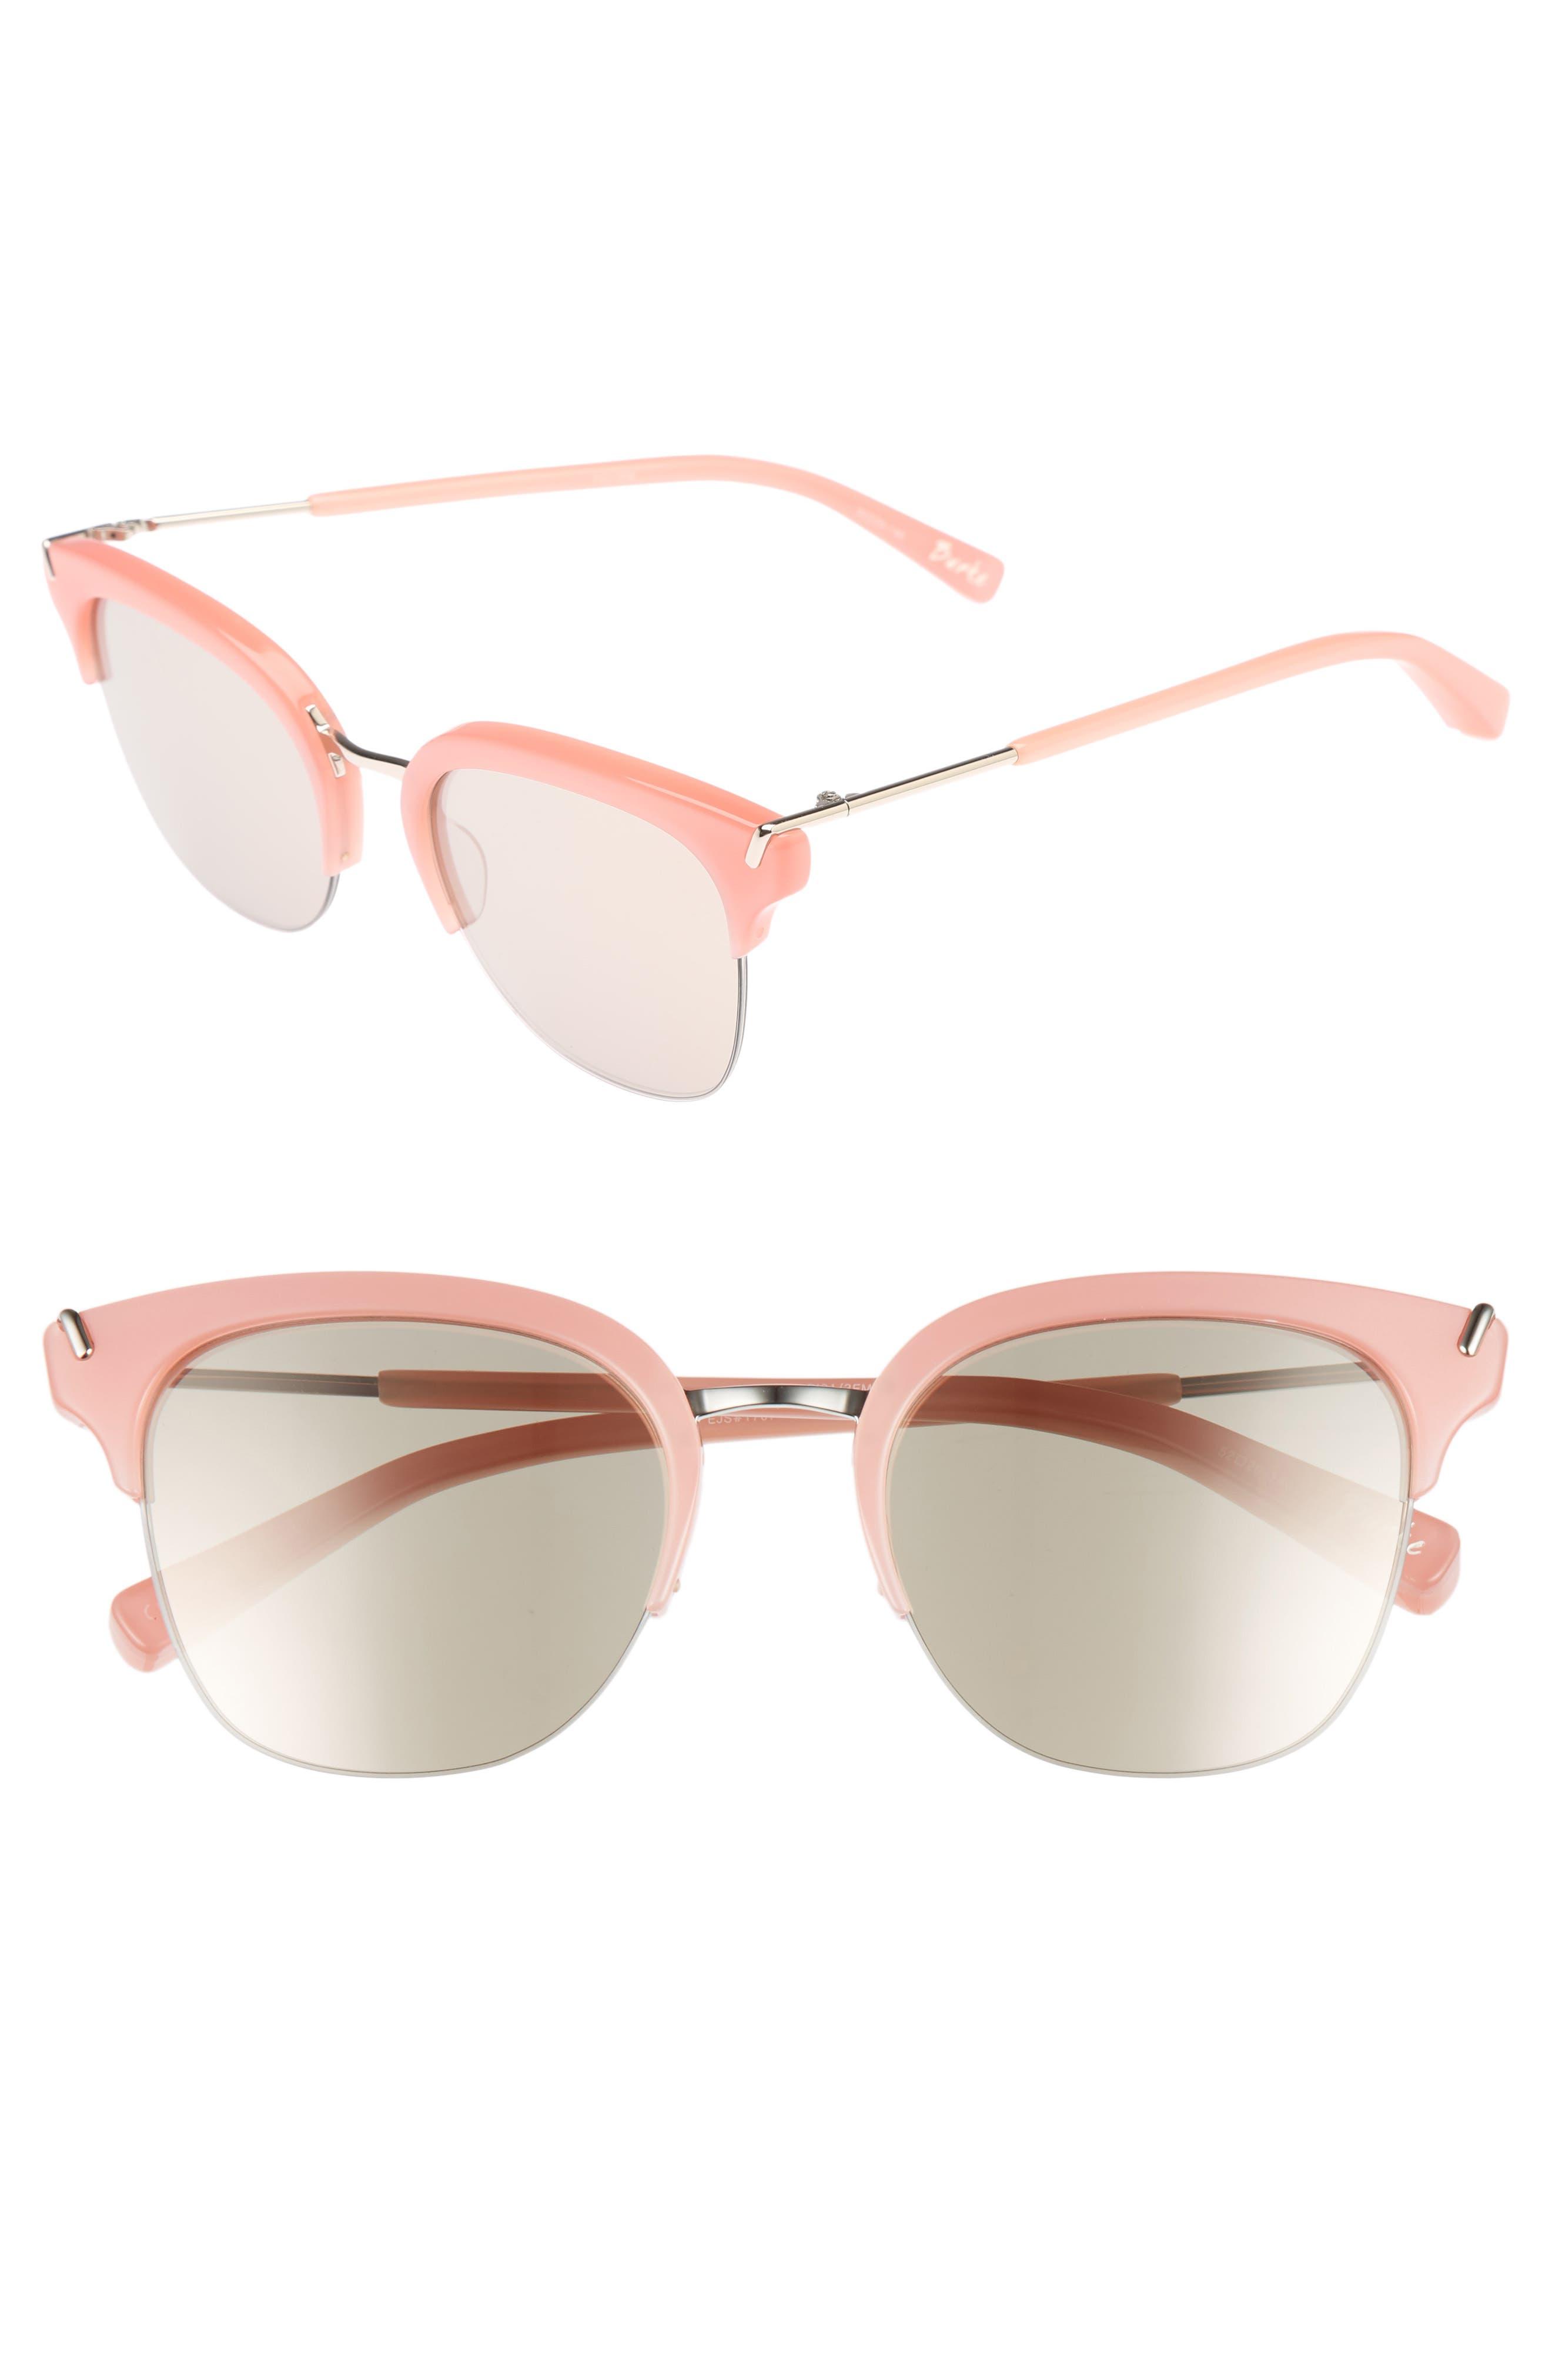 Burke 52mm Horn Rimmed Sunglasses,                             Main thumbnail 1, color,                             001